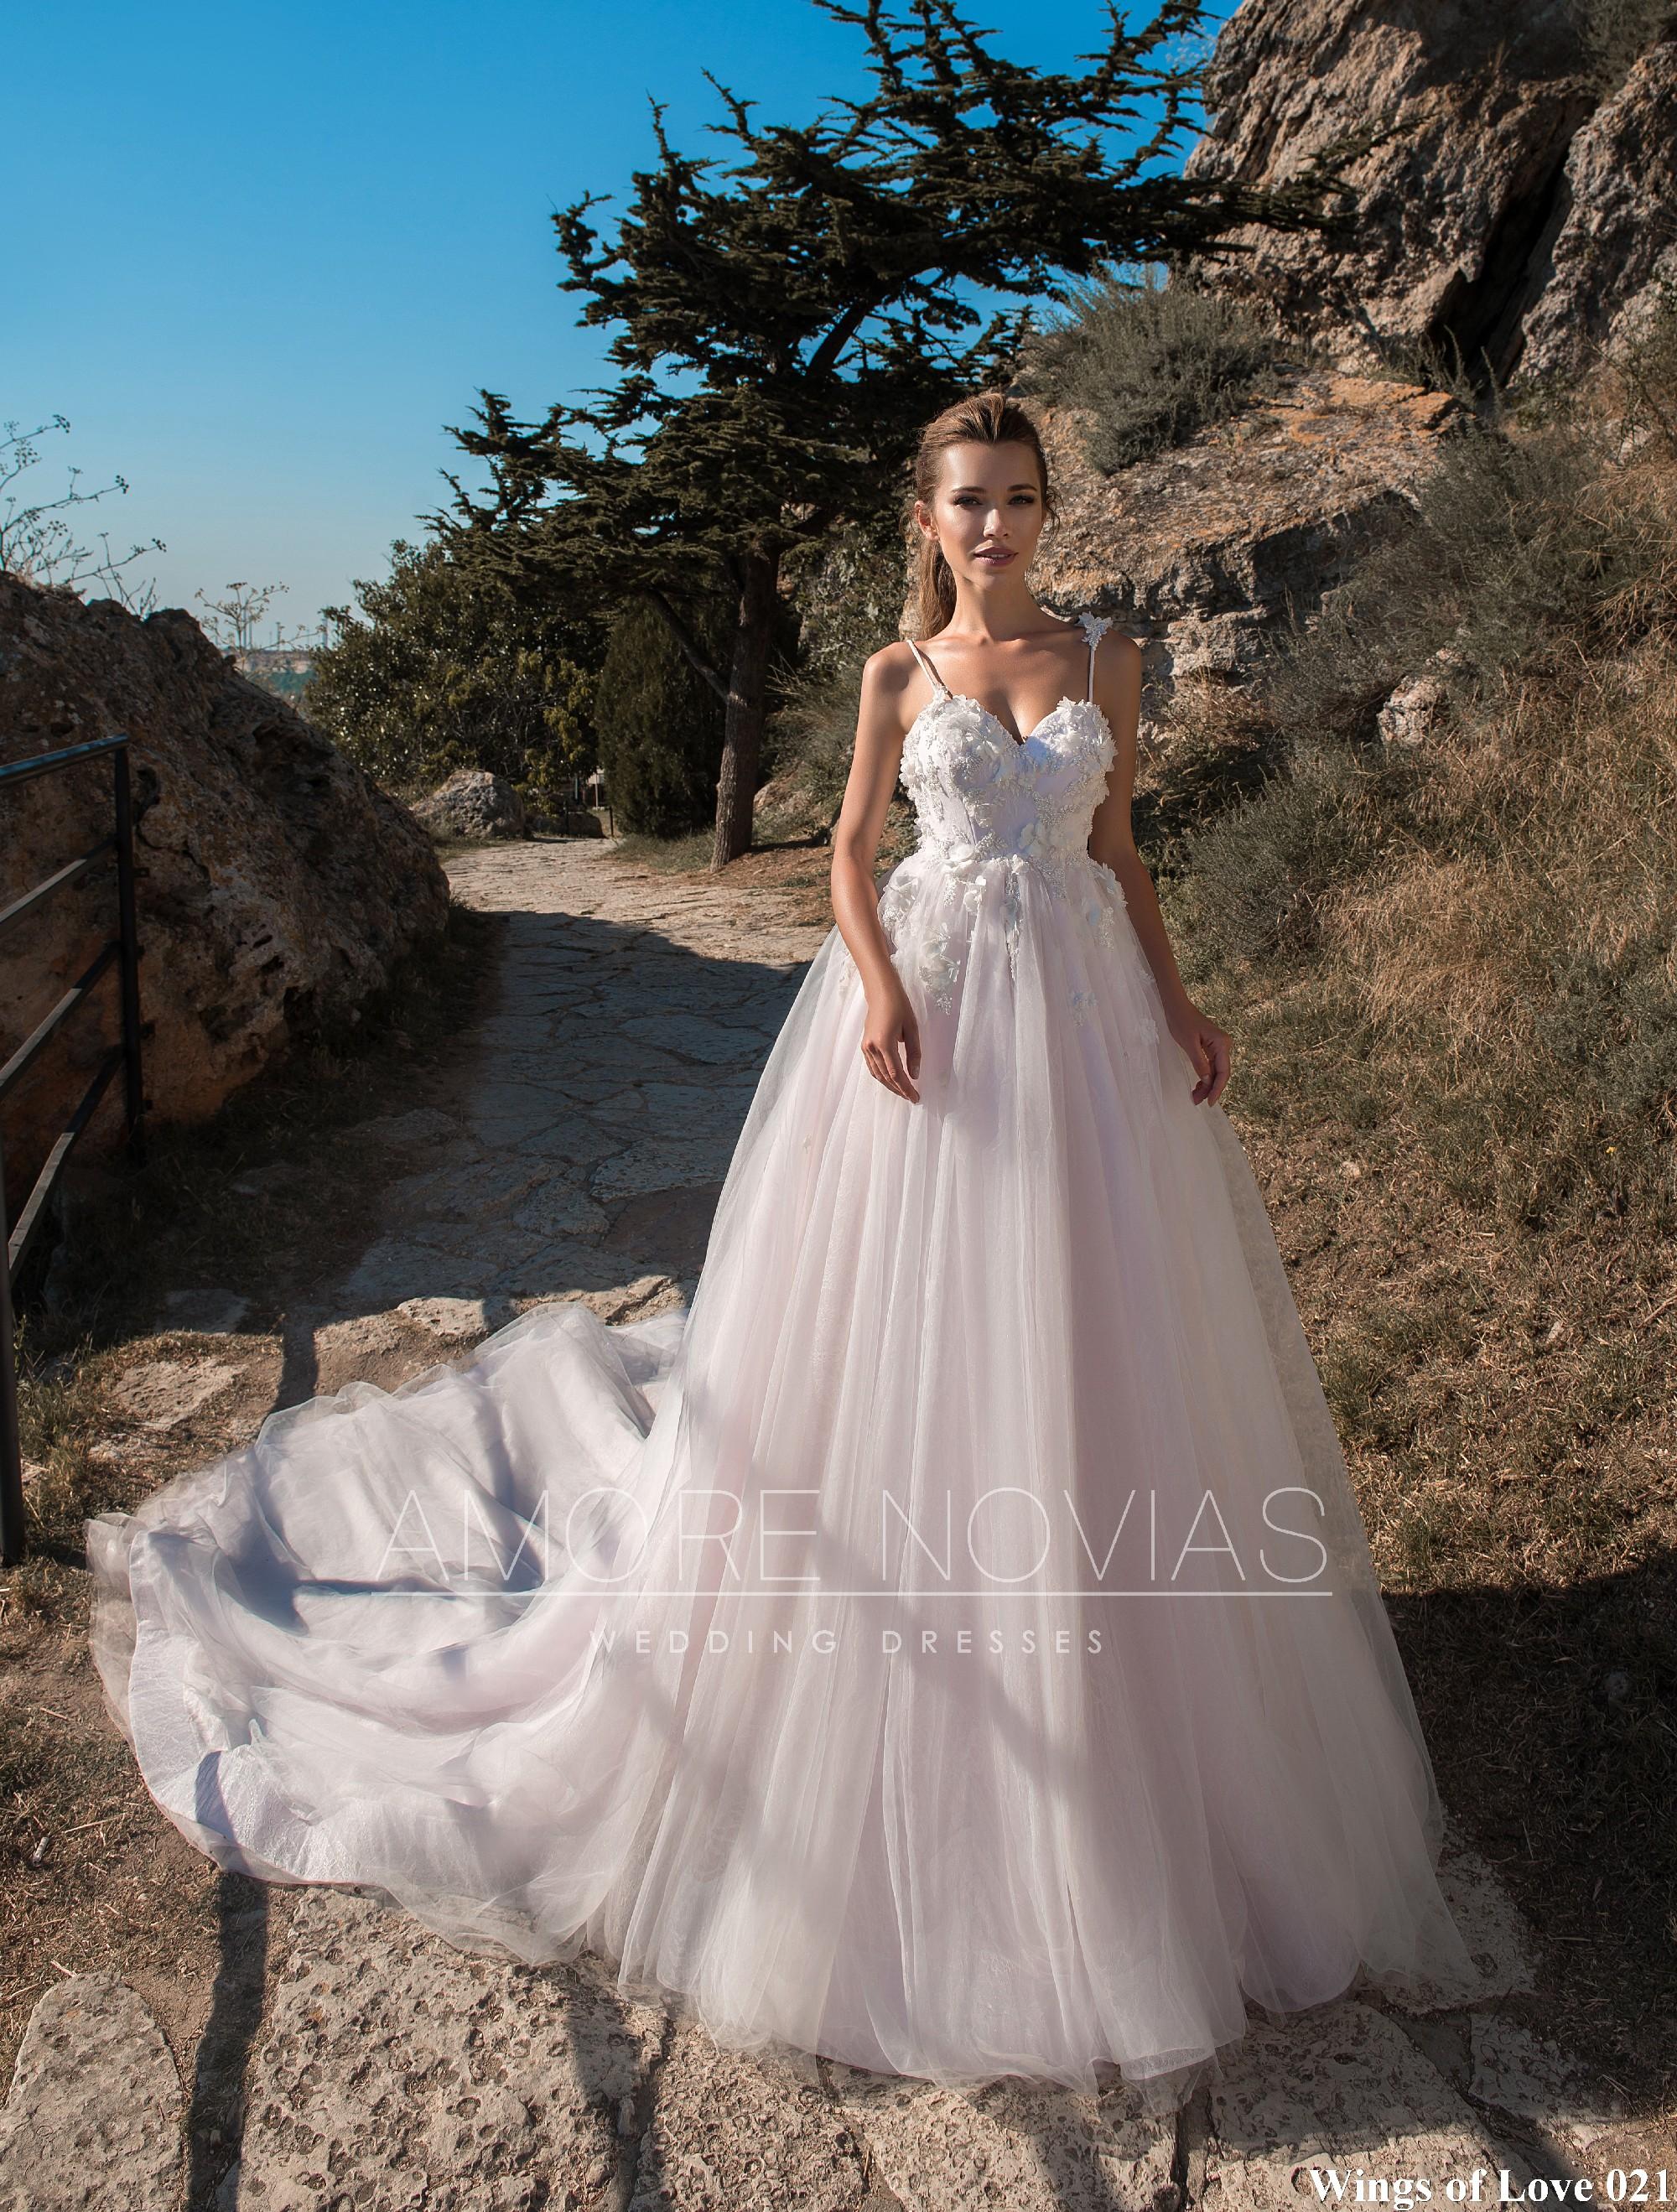 http://amore-novias.com/images/stories/virtuemart/product/lk-021-------(1).jpg